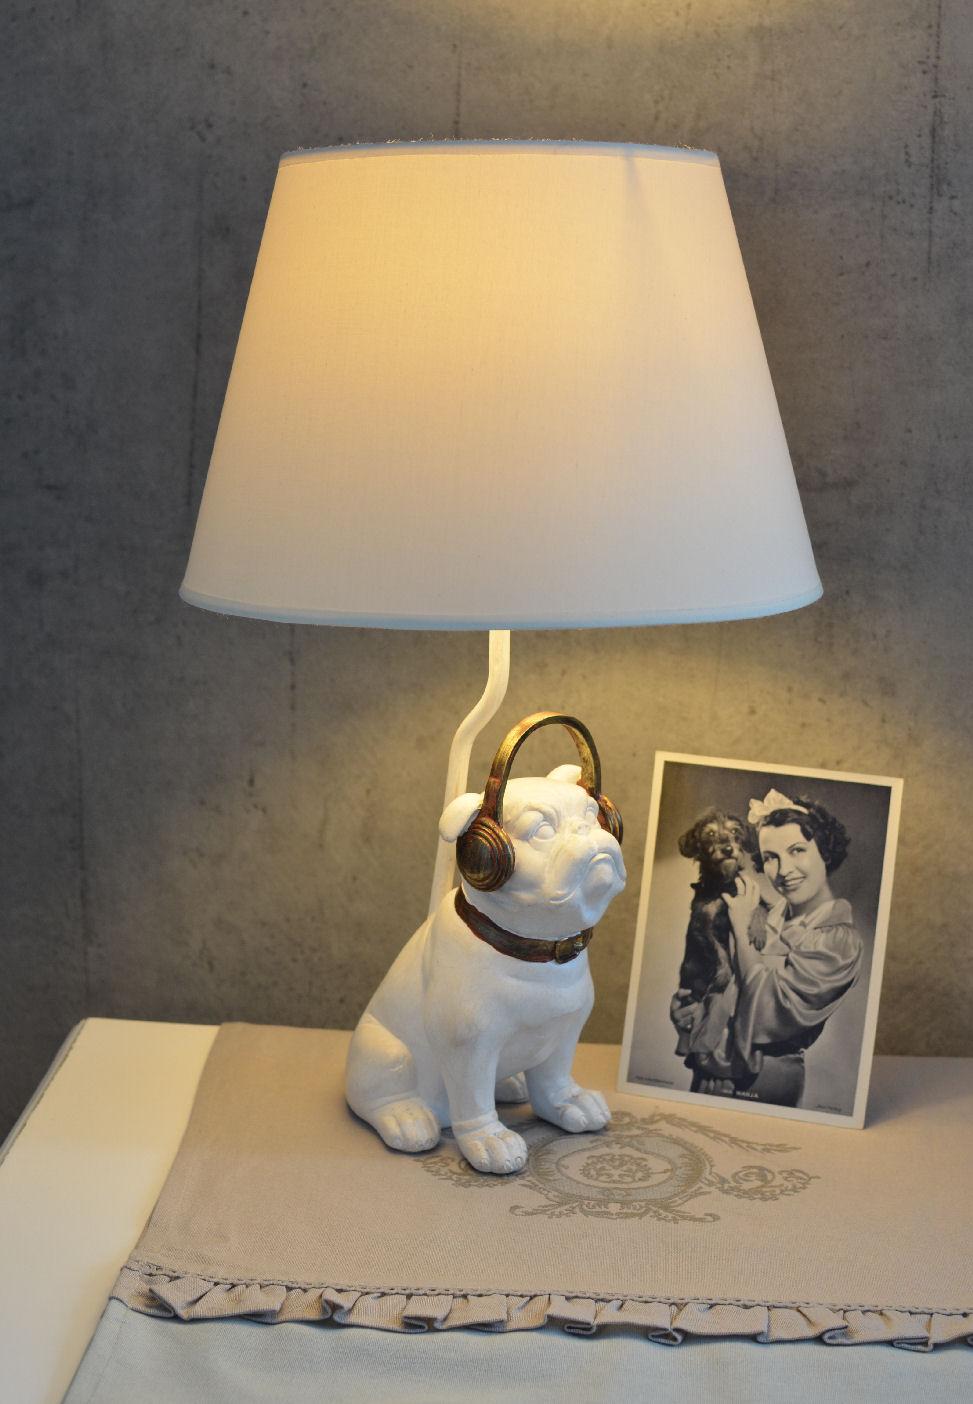 tischlampe mops weiss lampe bulldogge hundelampe shabby chic leuchte ebay. Black Bedroom Furniture Sets. Home Design Ideas